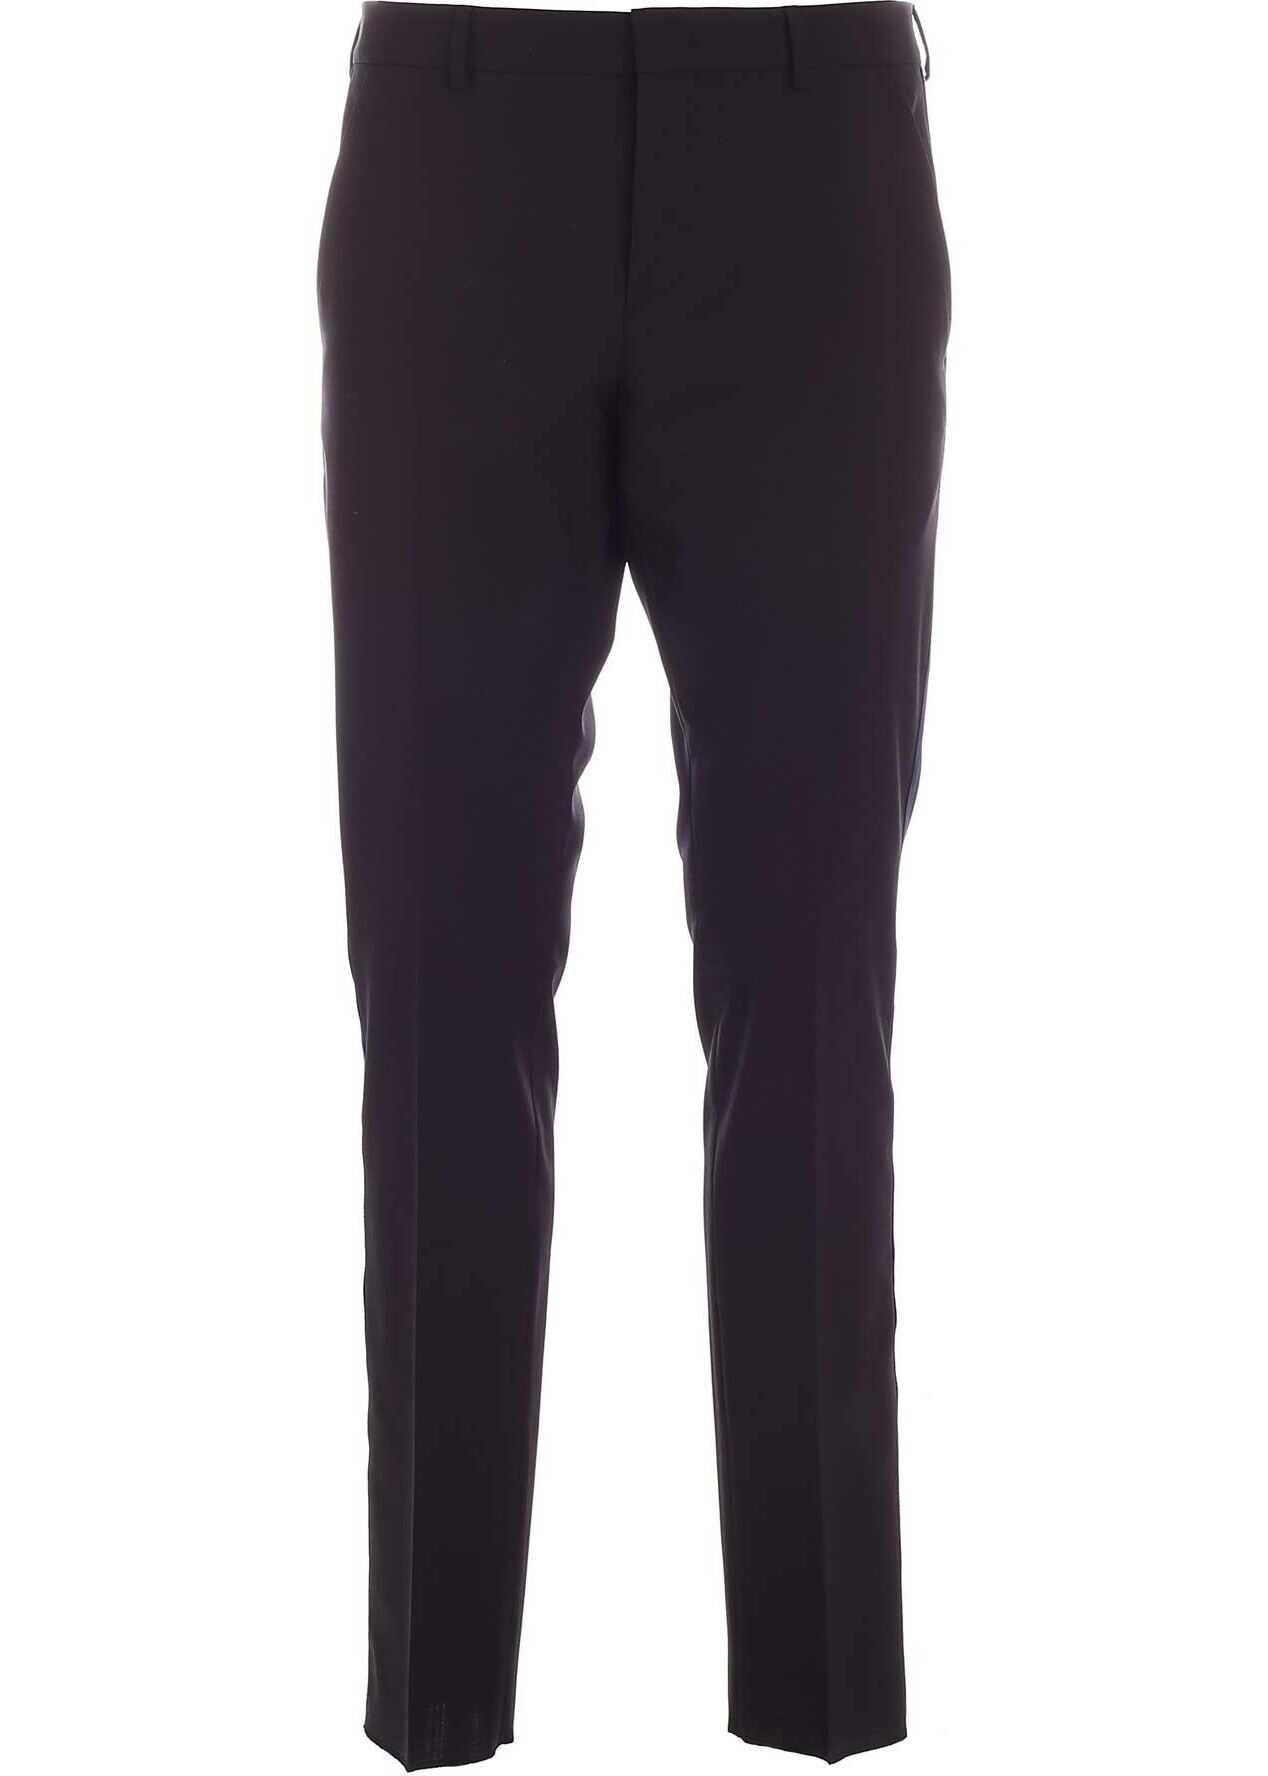 Valentino Garavani Blue Band Pants In Black Black imagine